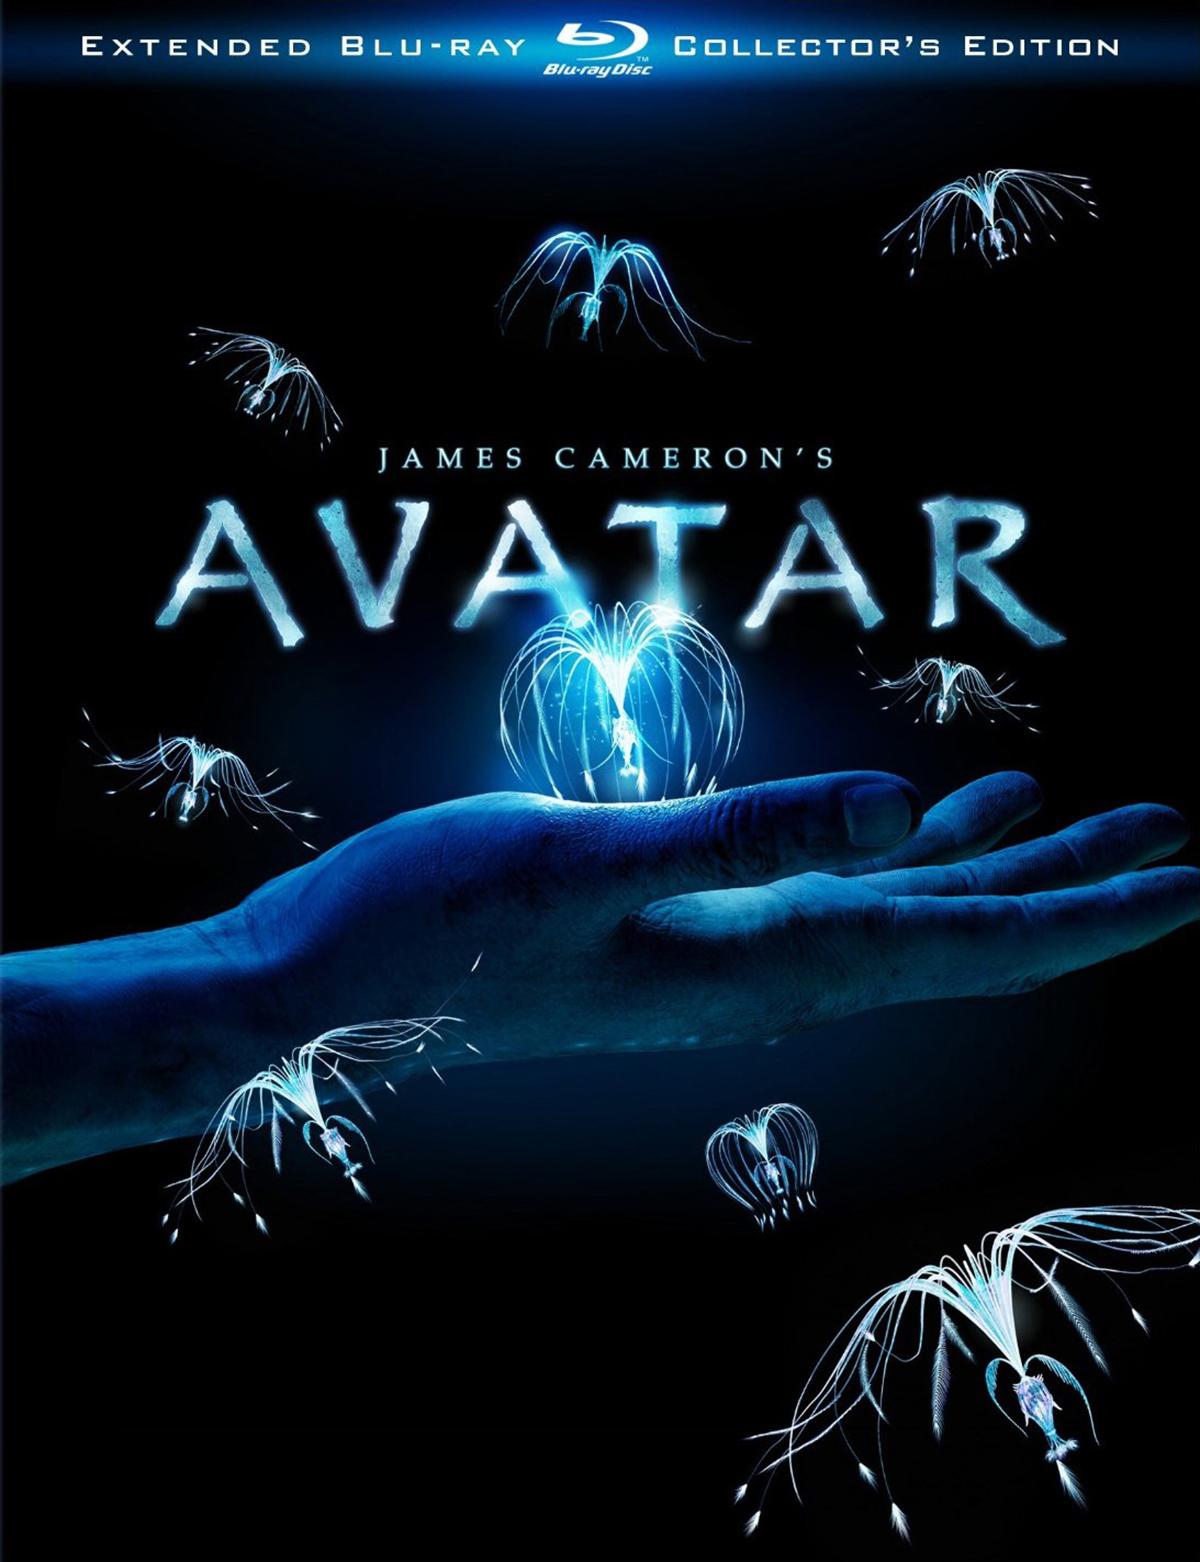 Winged Avatars Of Memory And Return >> Blu Ray Review Avatar Slant Magazine